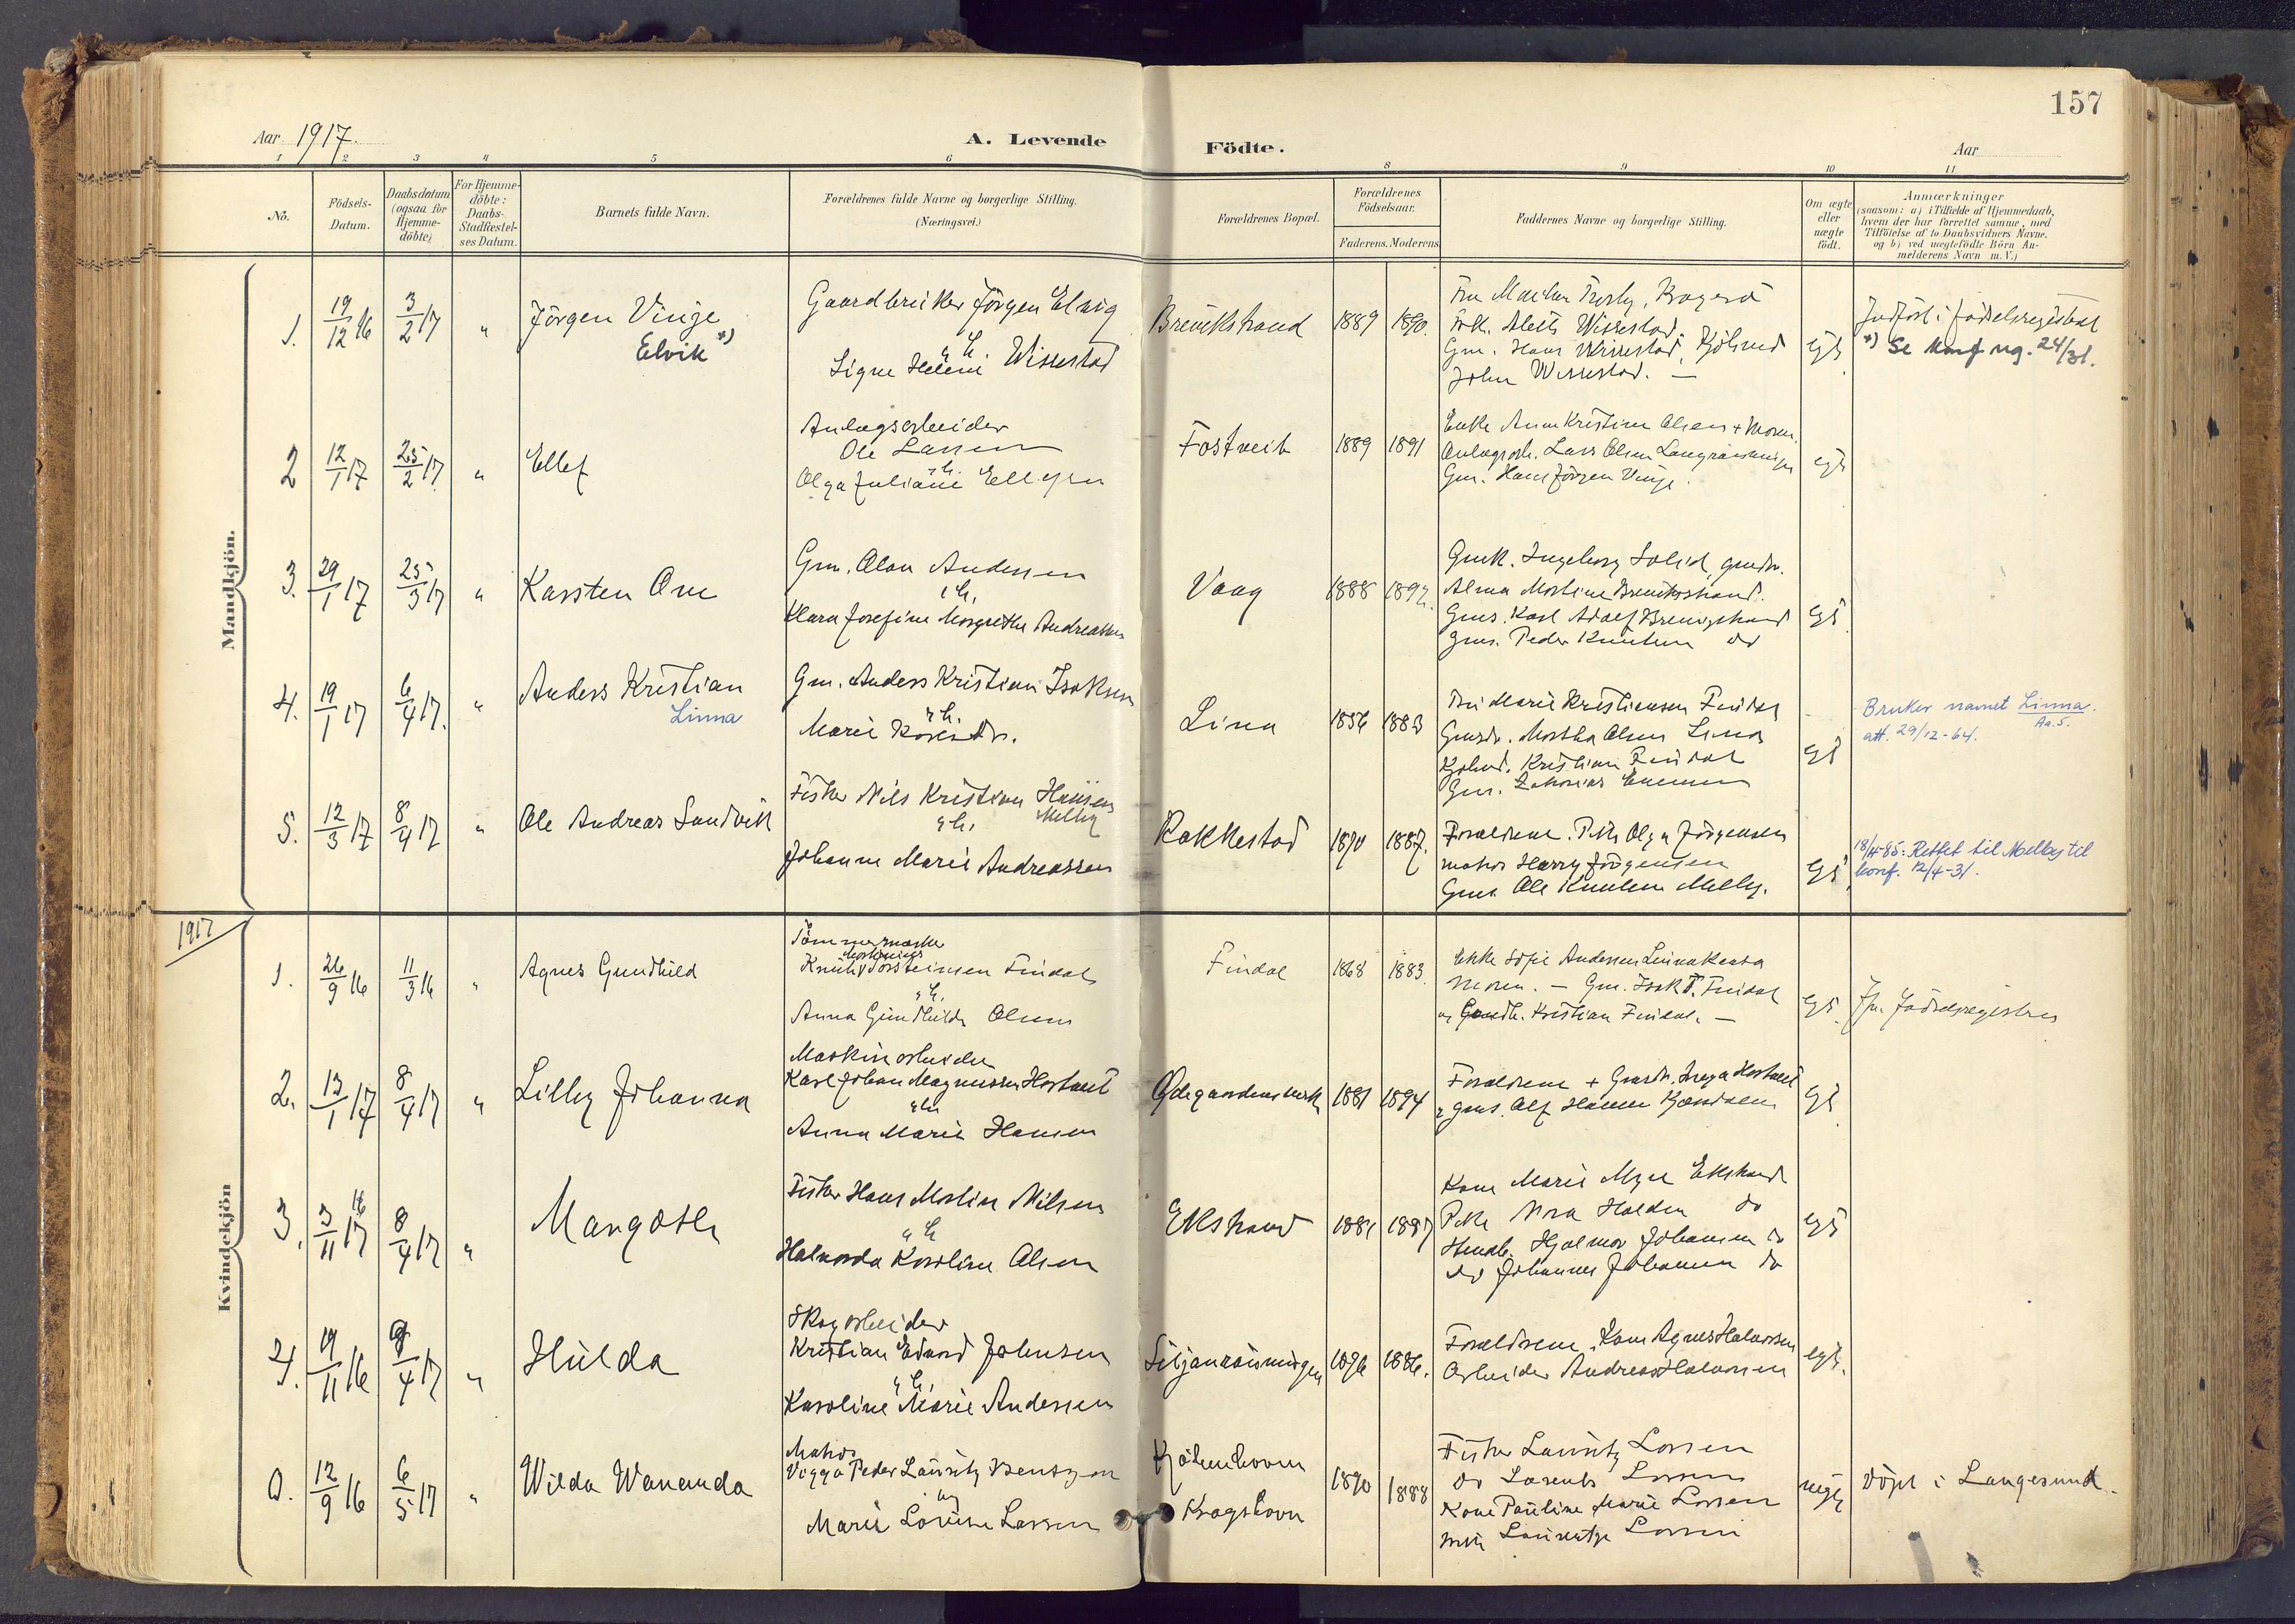 SAKO, Bamble kirkebøker, F/Fa/L0009: Ministerialbok nr. I 9, 1901-1917, s. 157